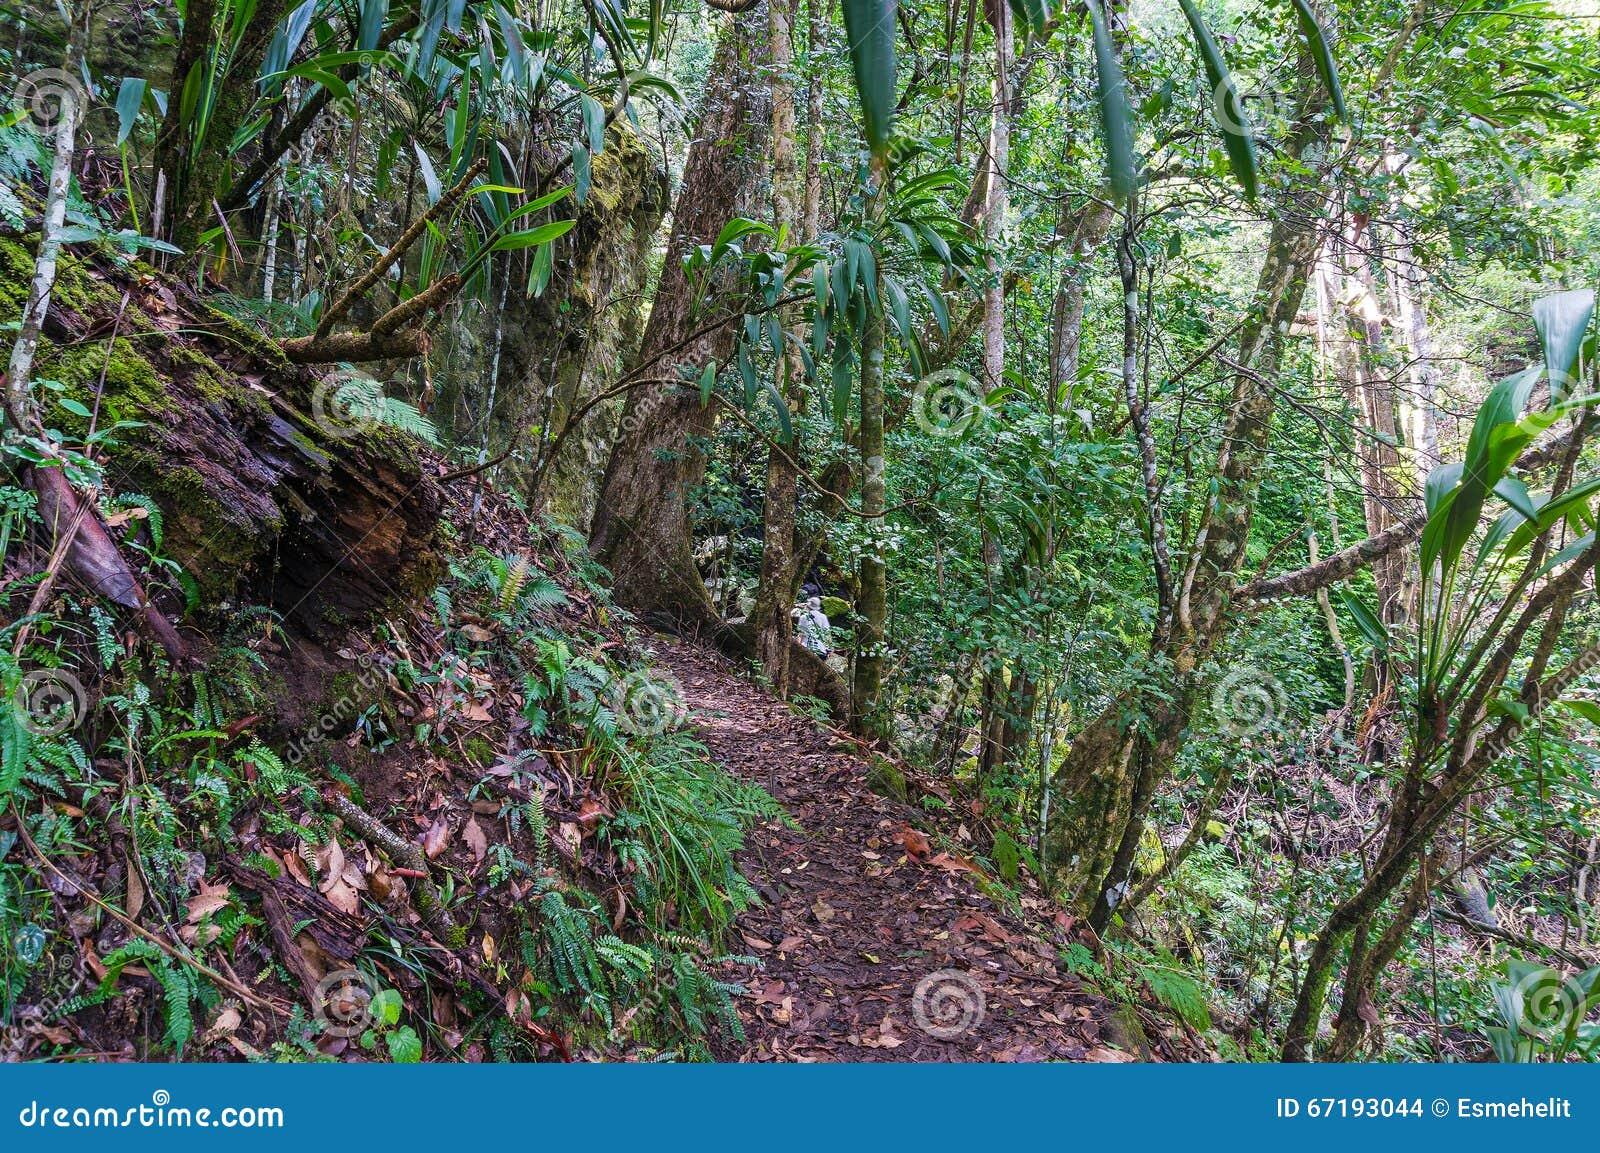 regenwaldweg wandern im tropischen regenwald stockfoto bild 67193044. Black Bedroom Furniture Sets. Home Design Ideas